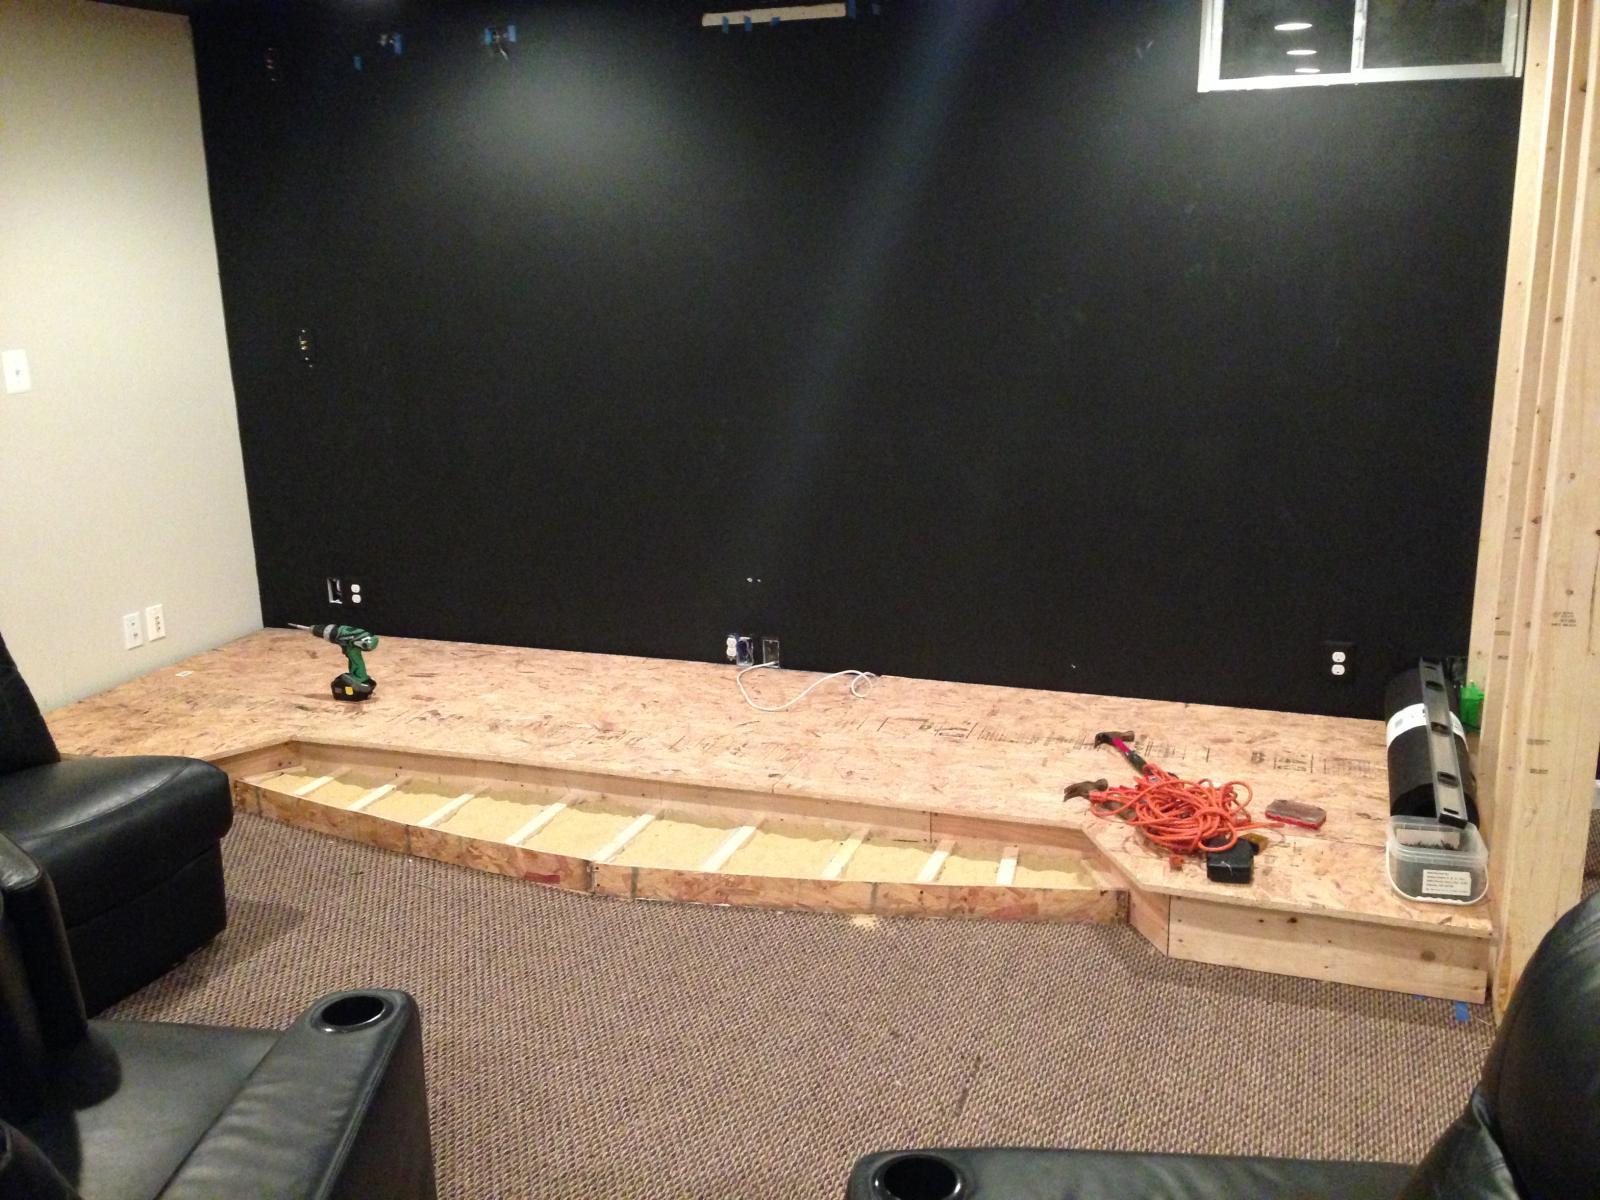 Jimmyk 39 s home theater build 2 0 a diy erskine design avs forum home theater discussions - Home theater screen wall design ...